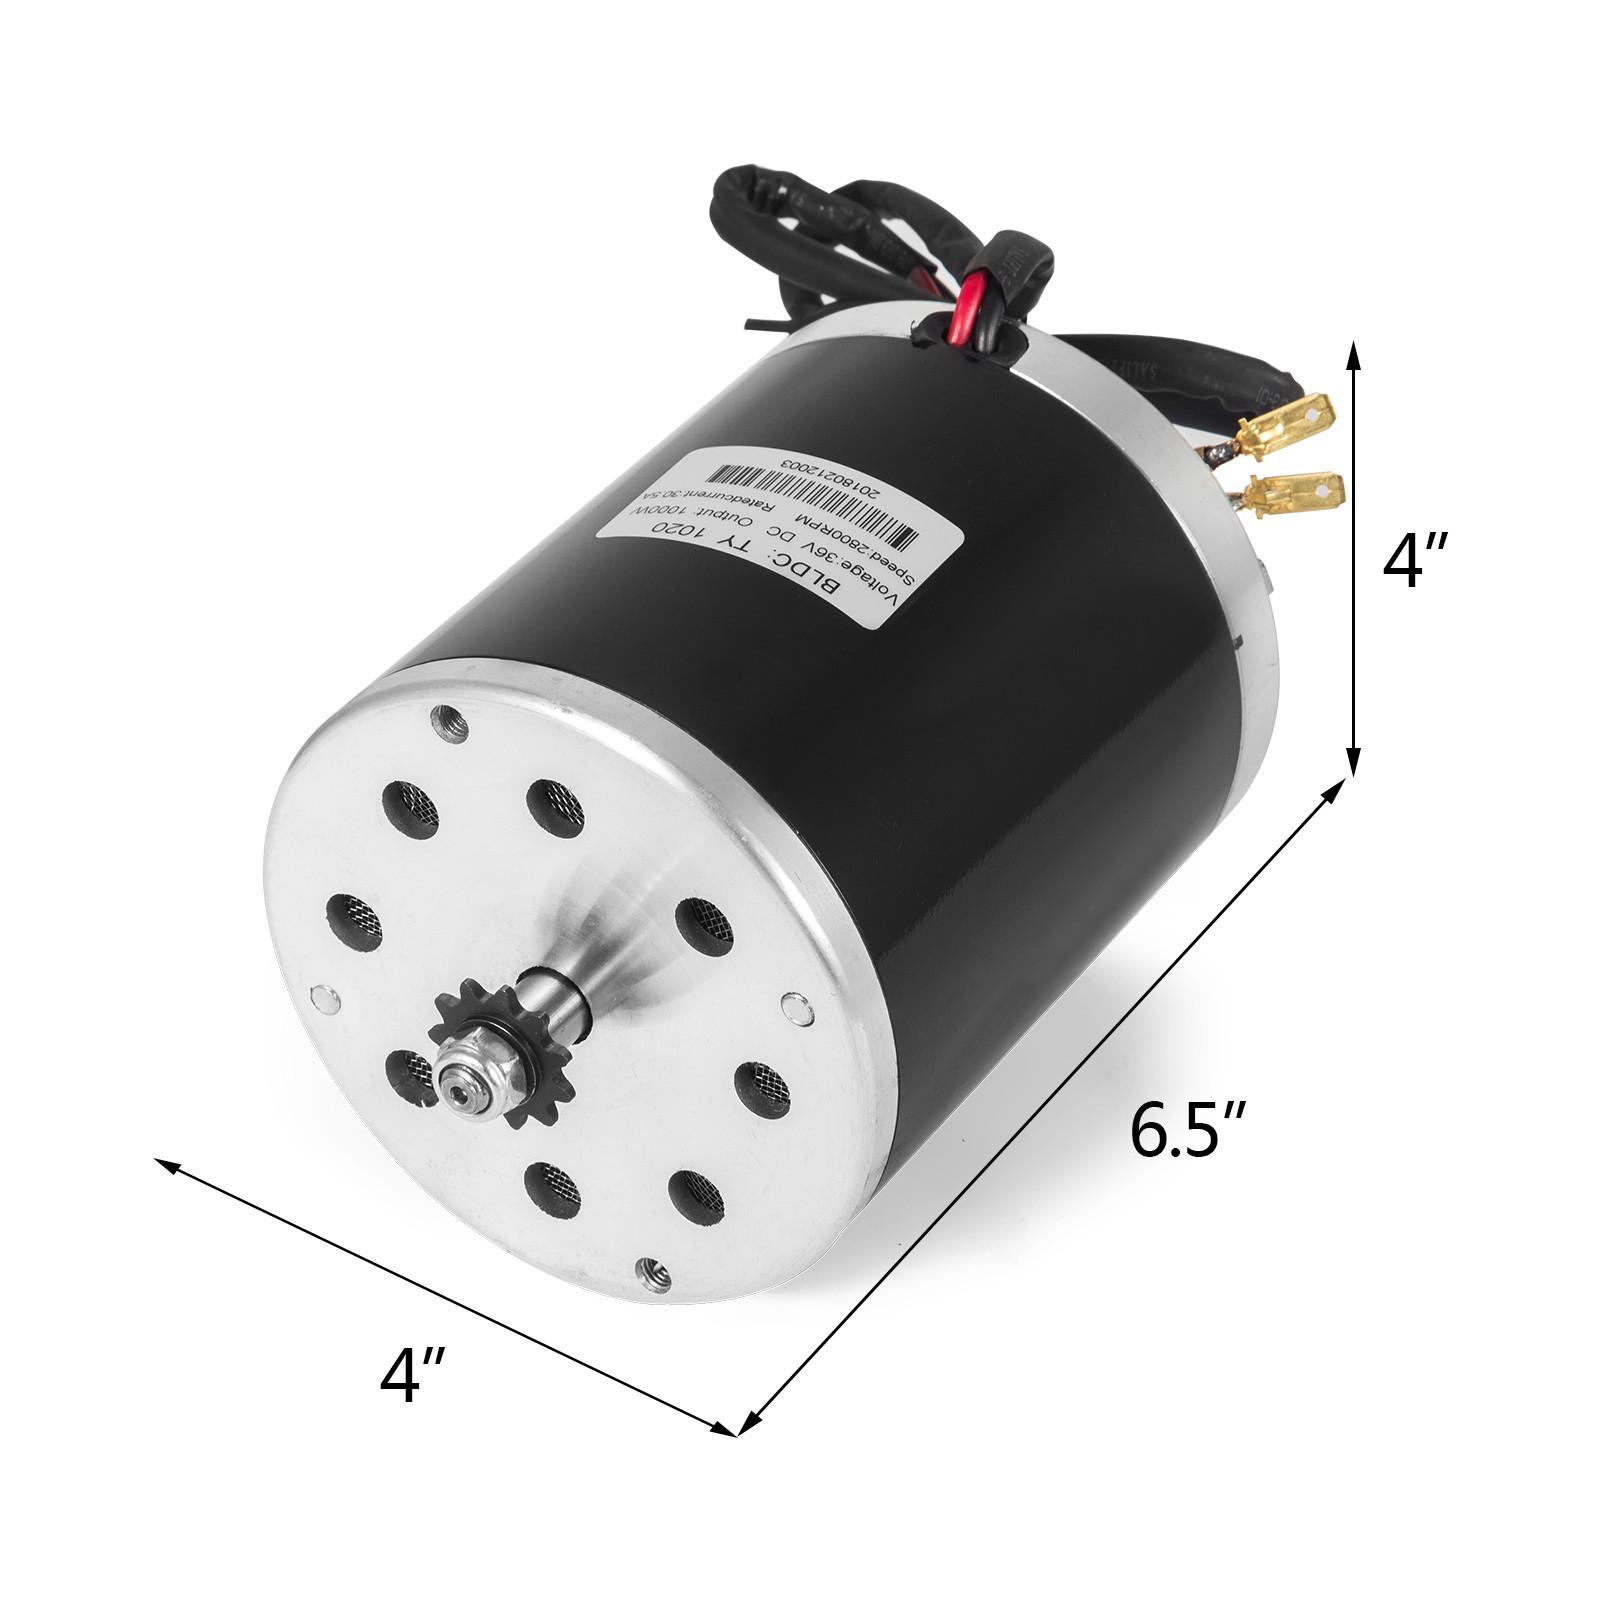 36v-Electric-Motor-controller-throttle-kit-f-Scooter-E-Scooter-ATV-Permanent thumbnail 98